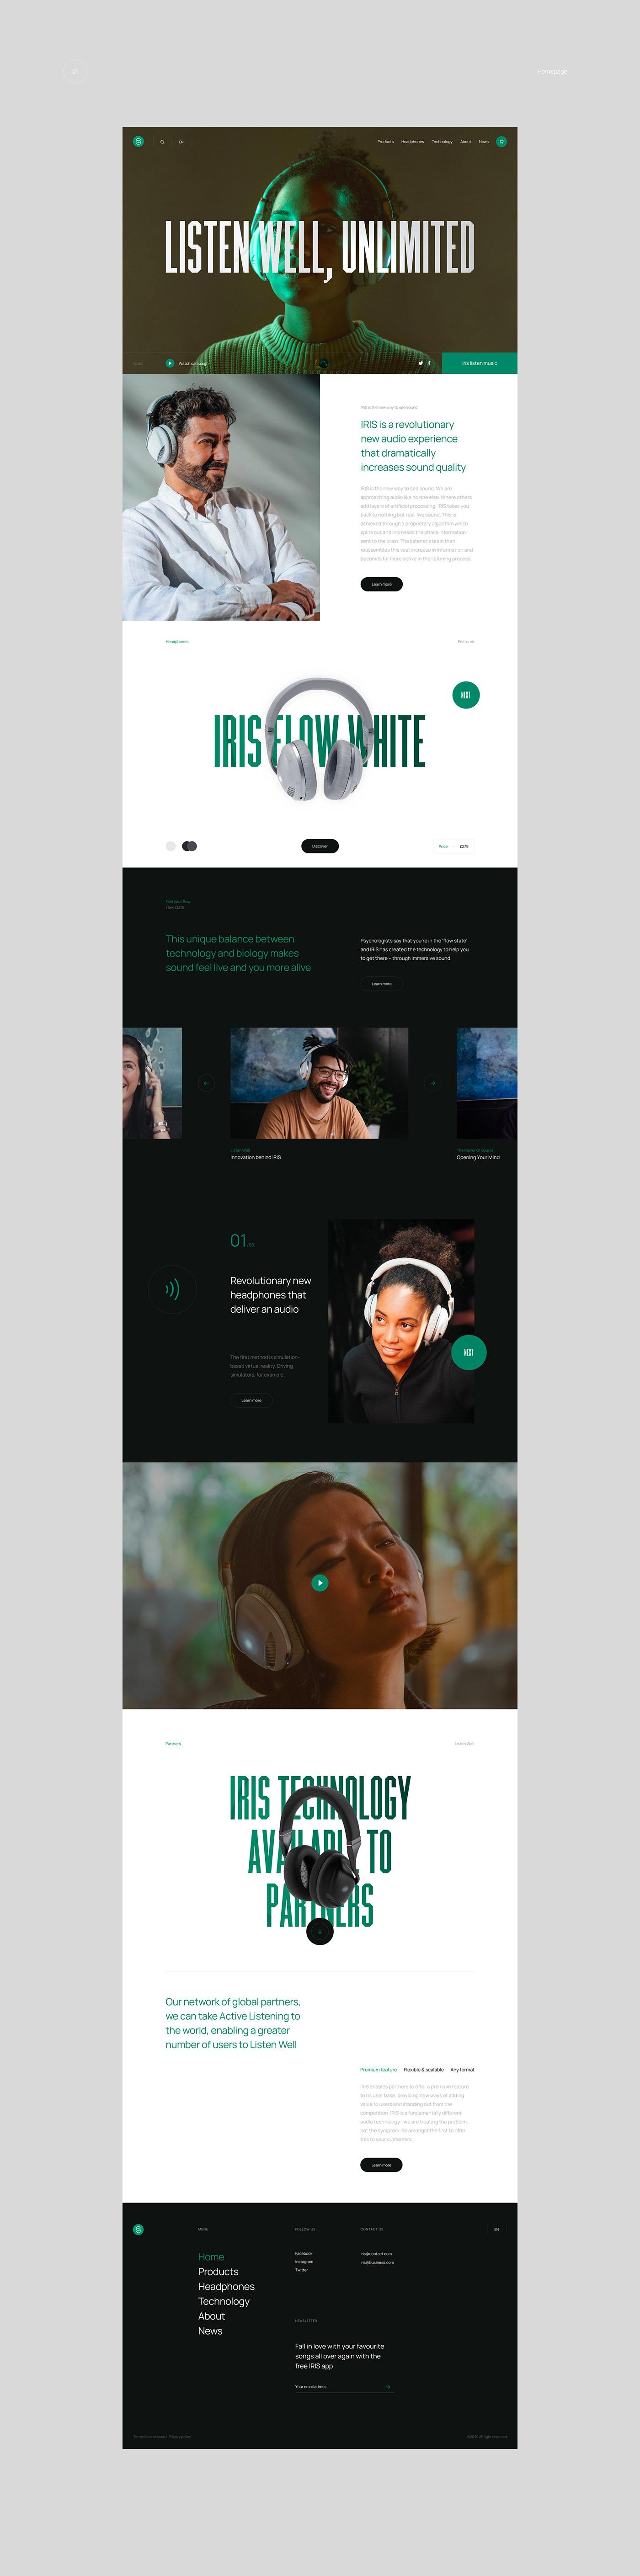 animation ,headphone,interaction,UI,ux,Interface,Webdesign,Website,Ecommerce,interactive